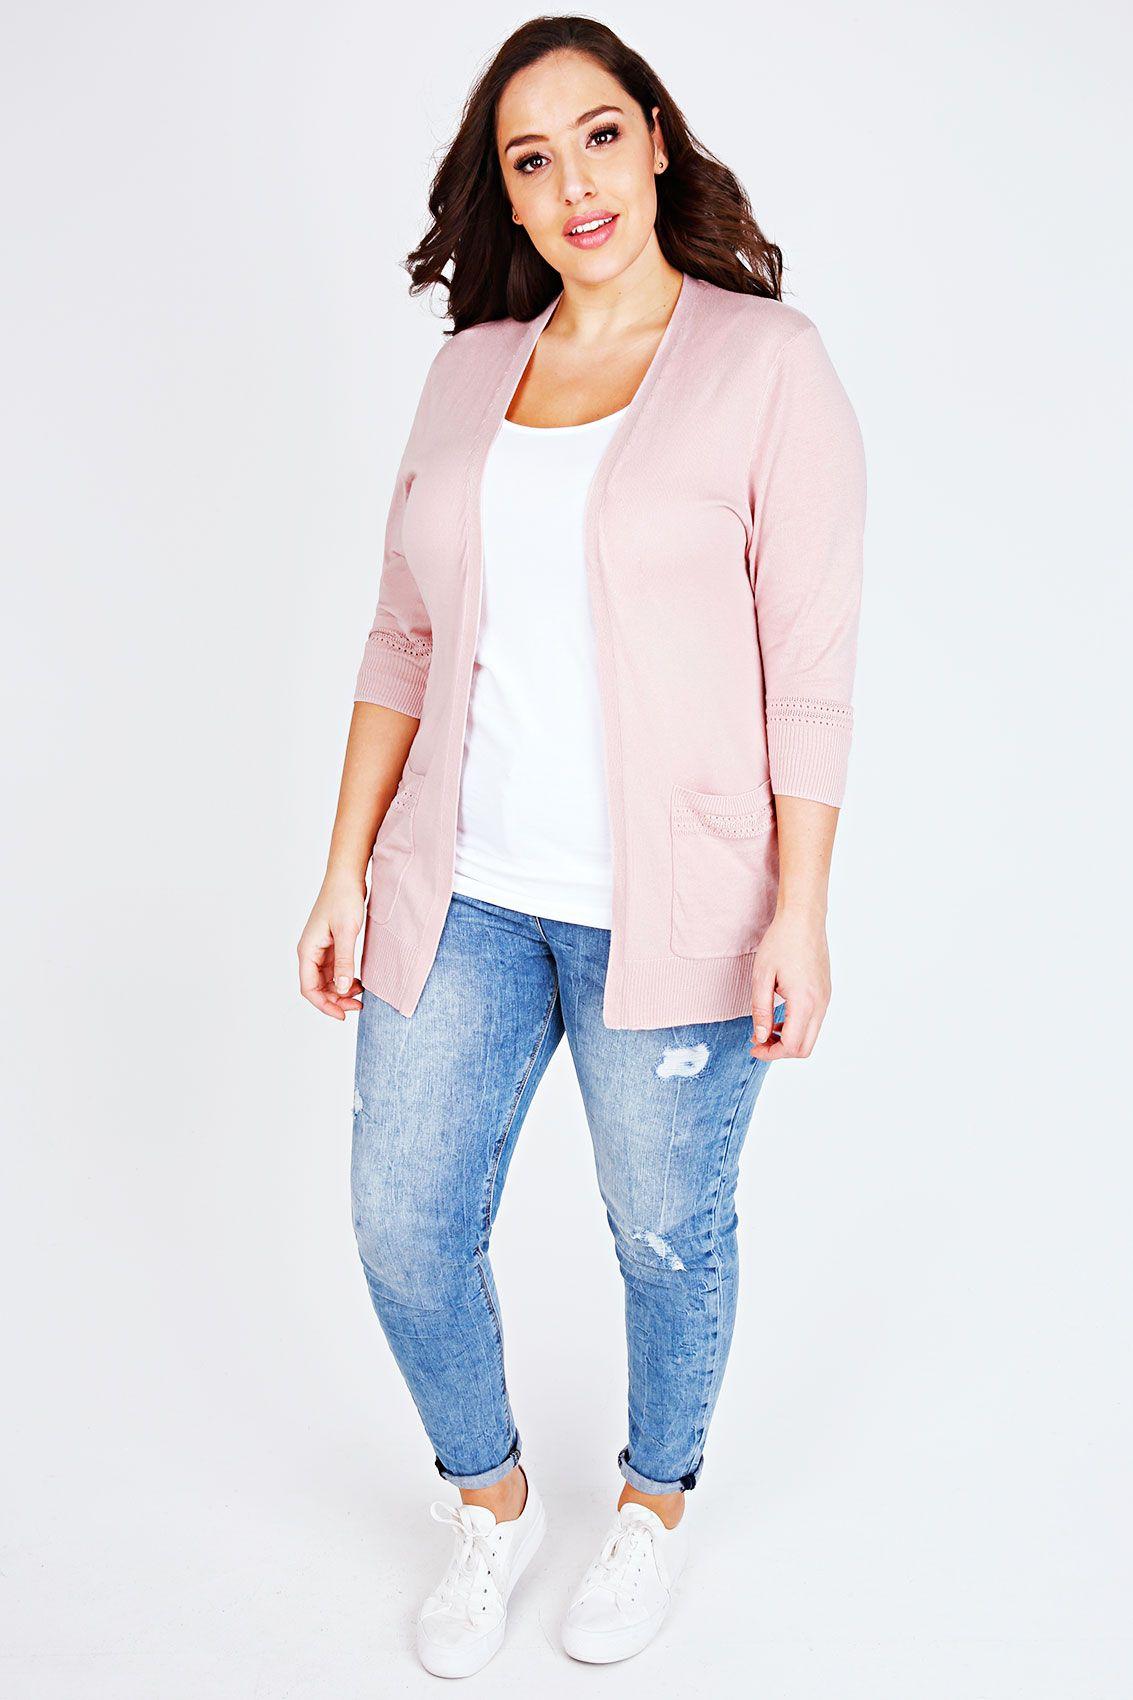 Pale Pink Longline Cardigan With Laser Cut Pocket & Cuff Details ...